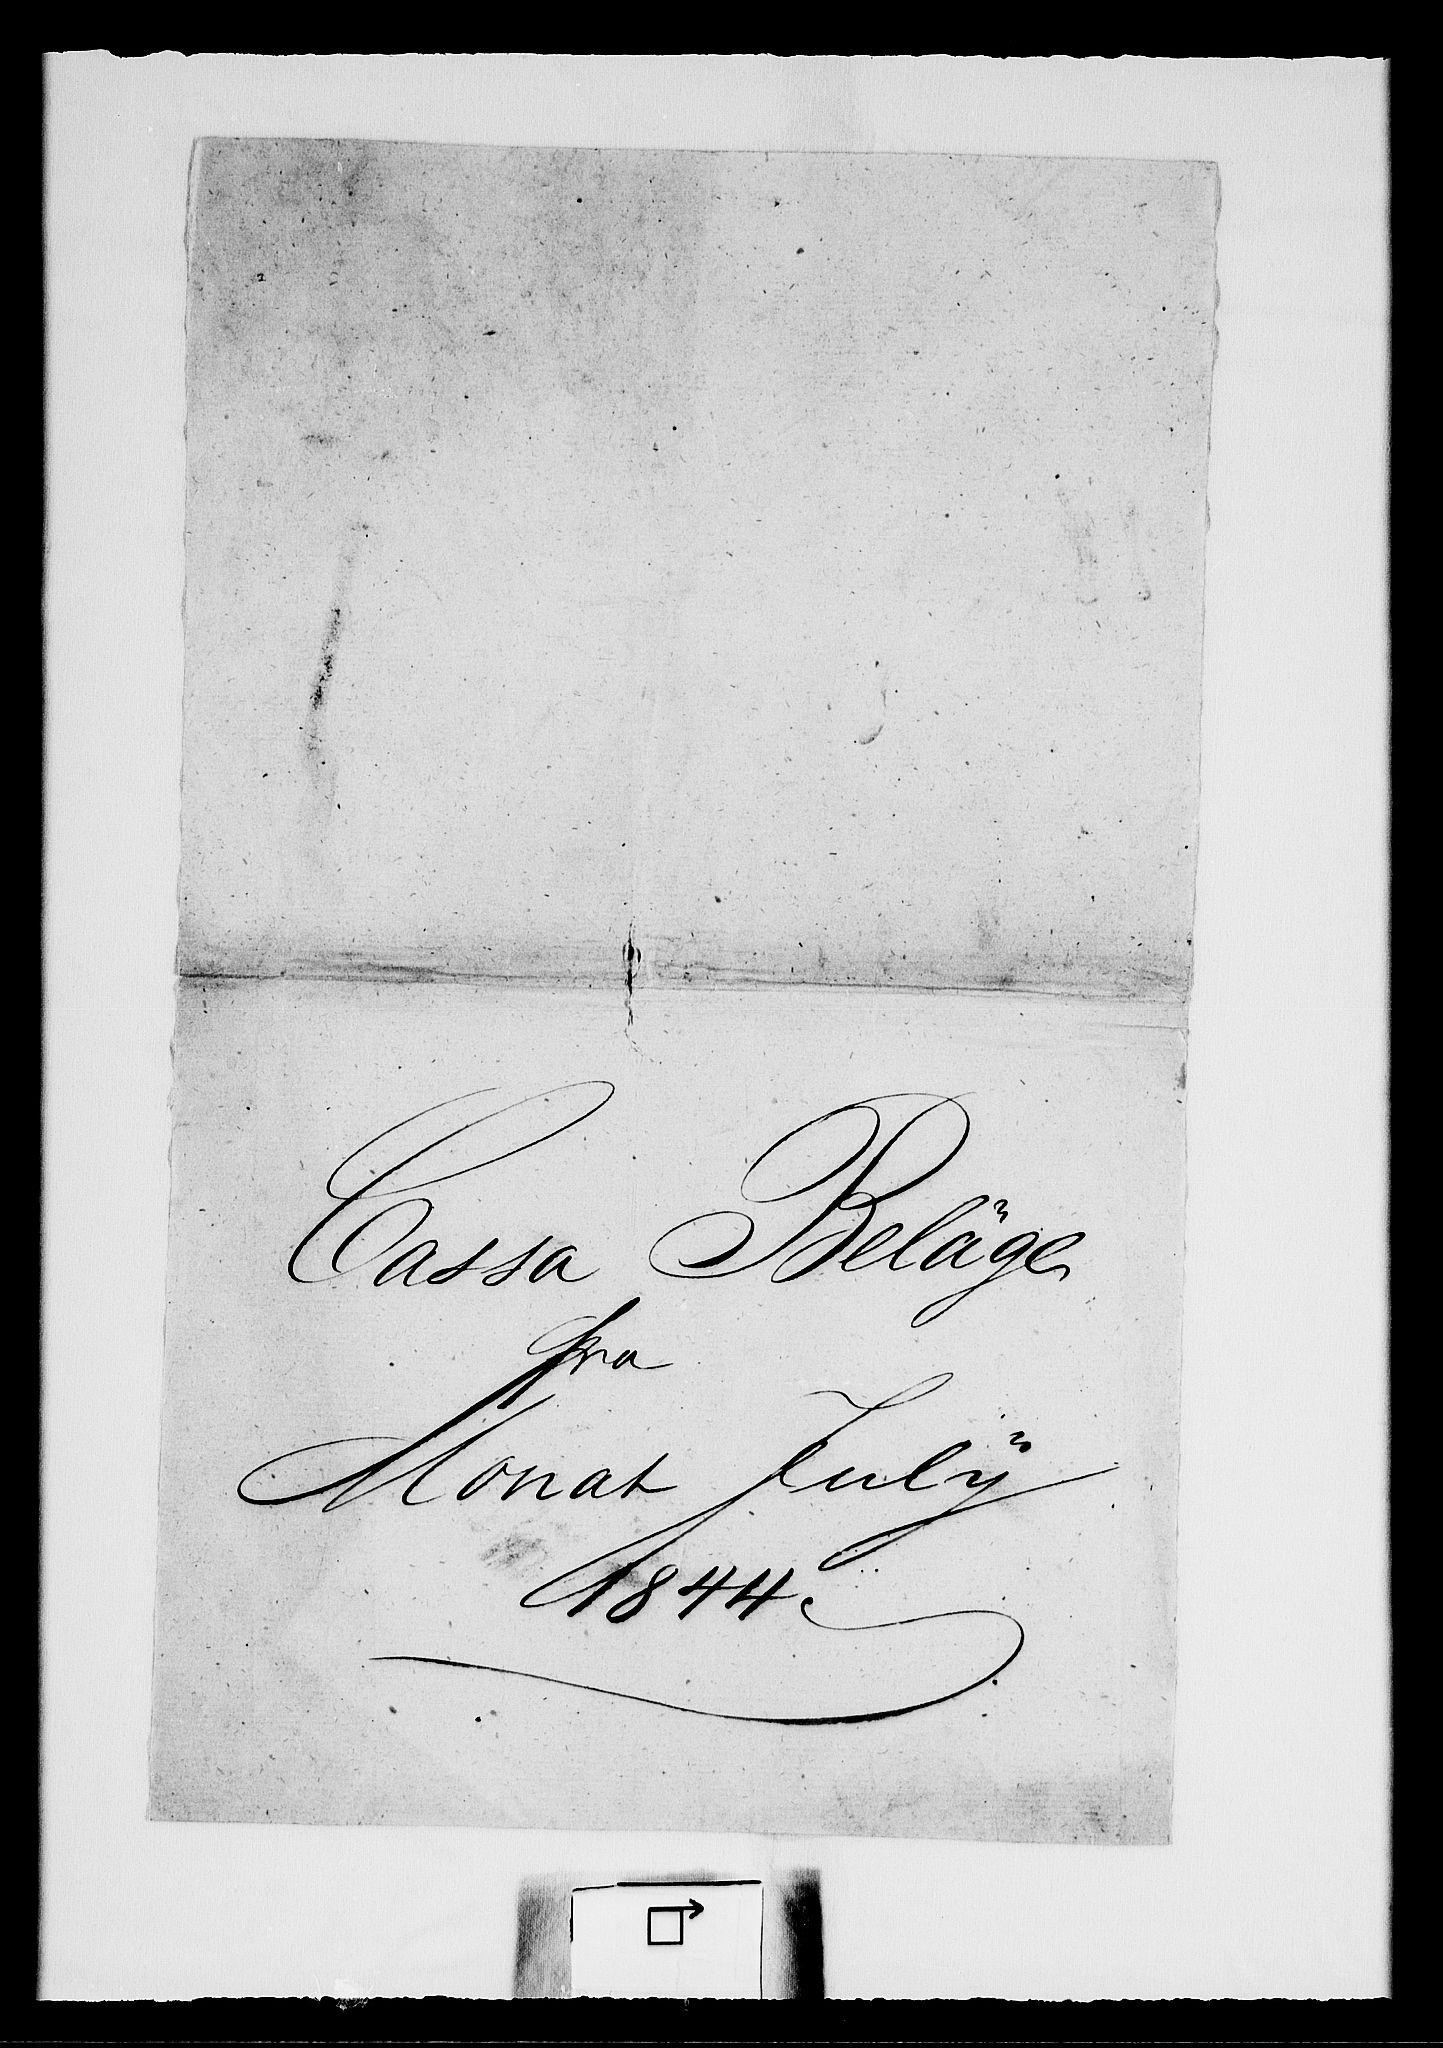 RA, Modums Blaafarveværk, G/Gd/Gdc/L0242, 1844-1846, s. 2